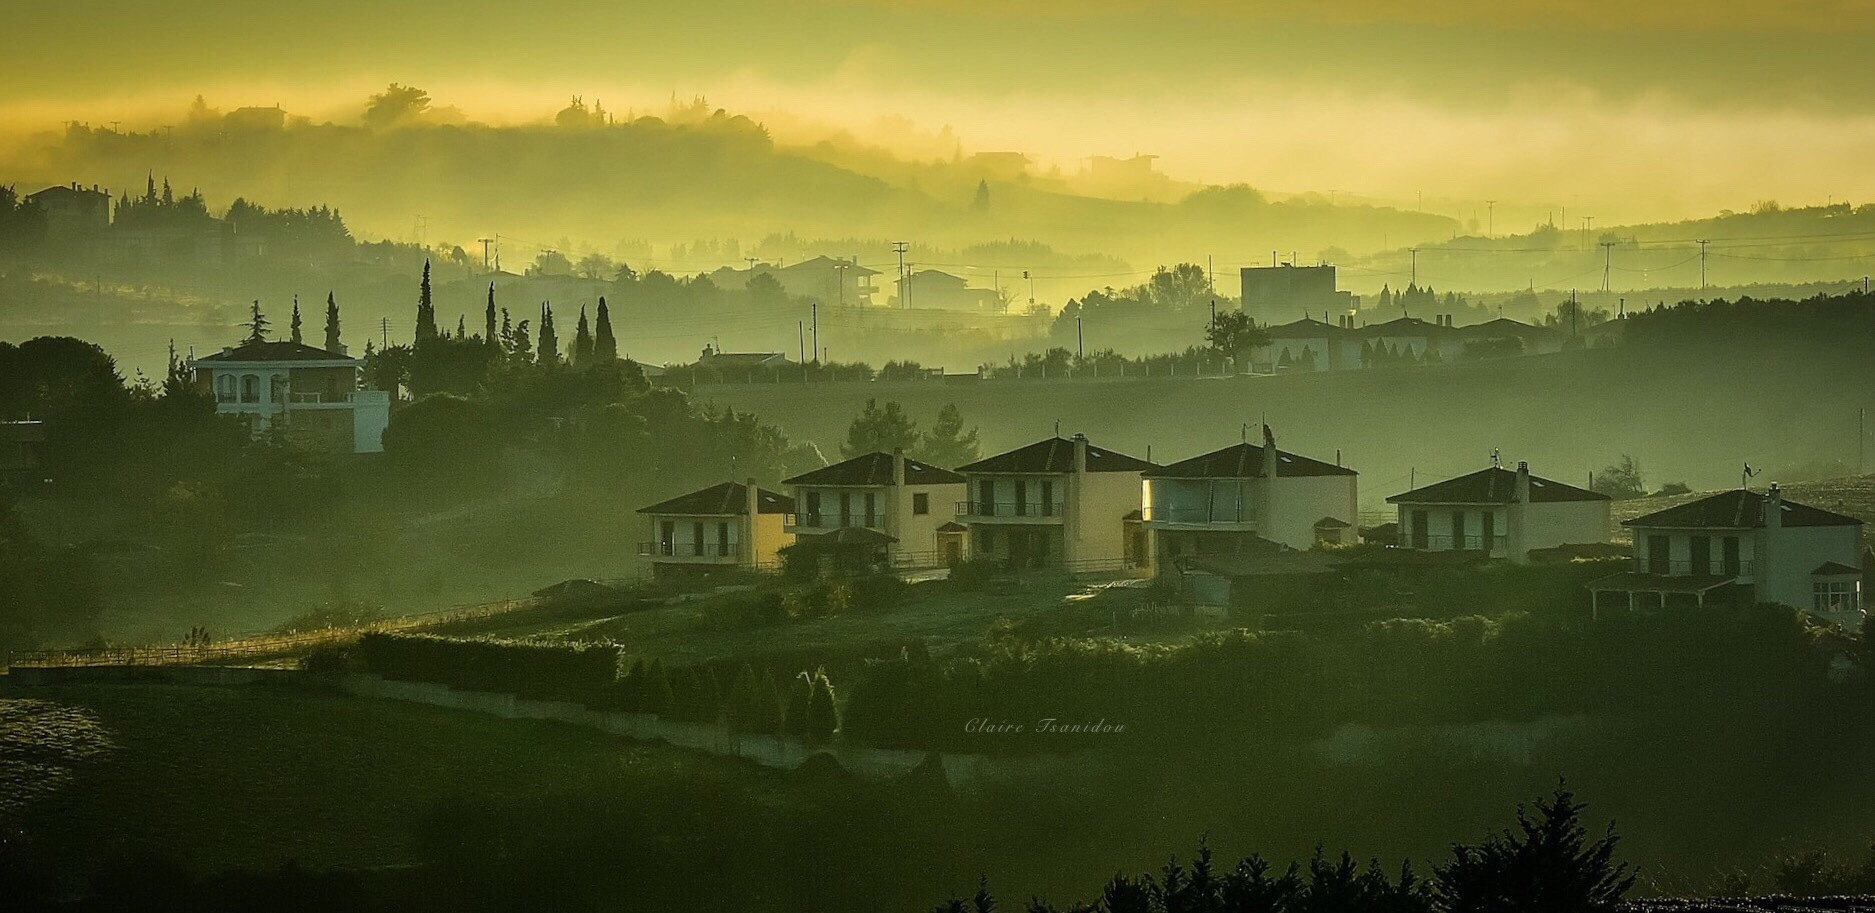 FOGGY SUNRISE by Foteini Tsanidou